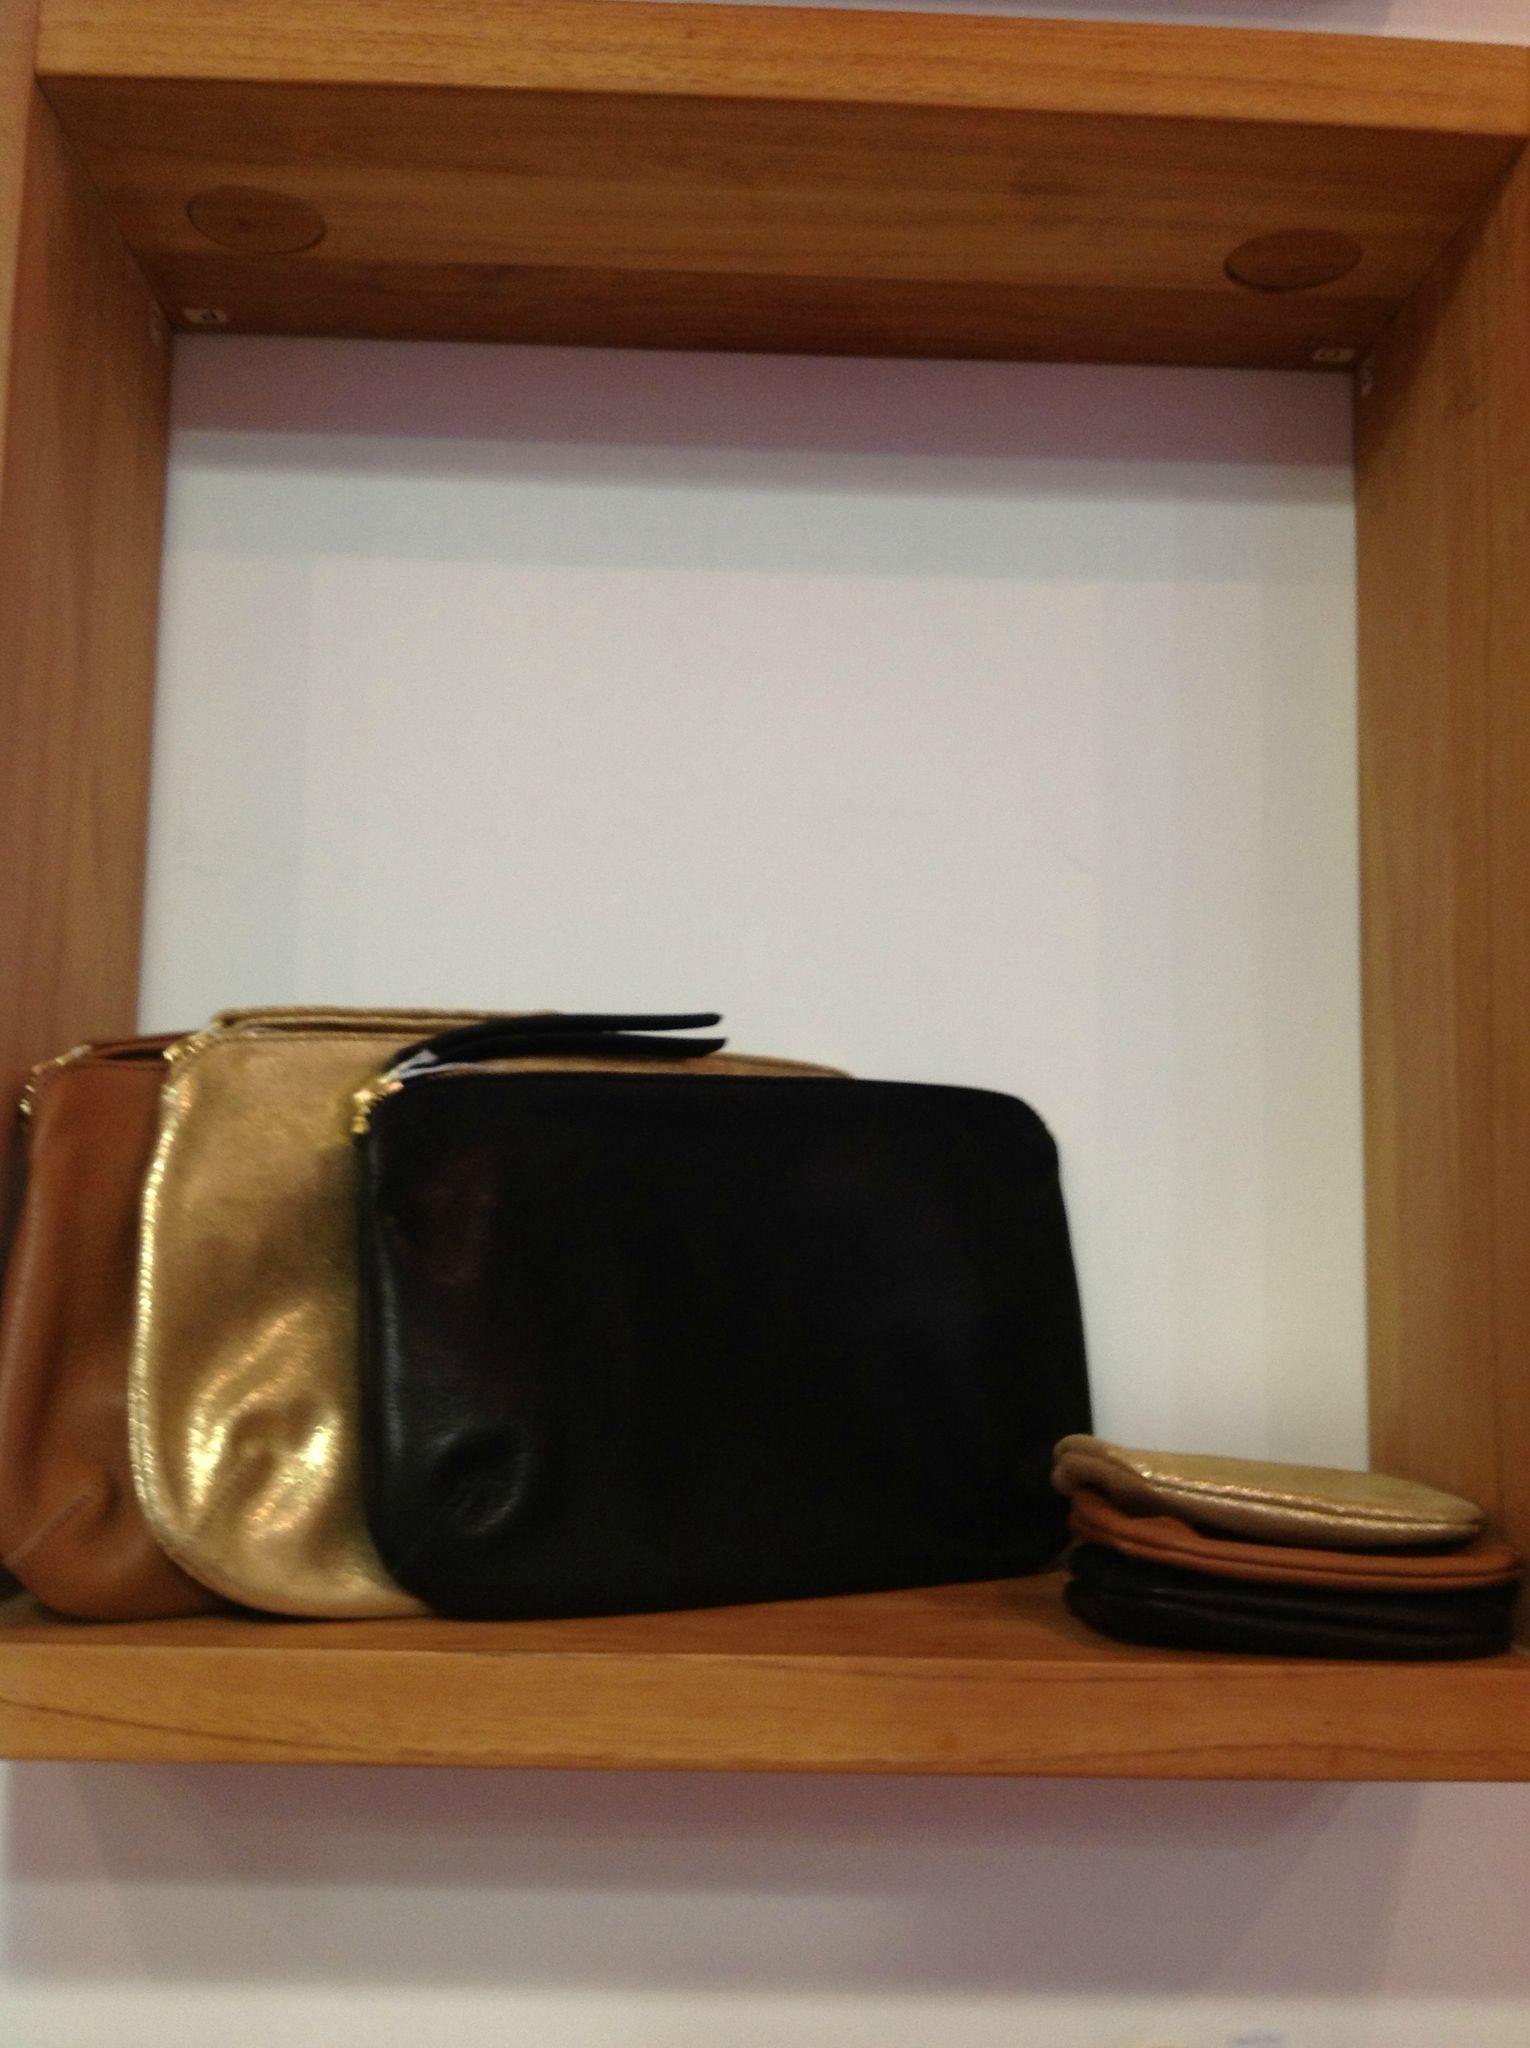 maroquinerie naterra printemps t 2013 boutique pipelette castres. Black Bedroom Furniture Sets. Home Design Ideas